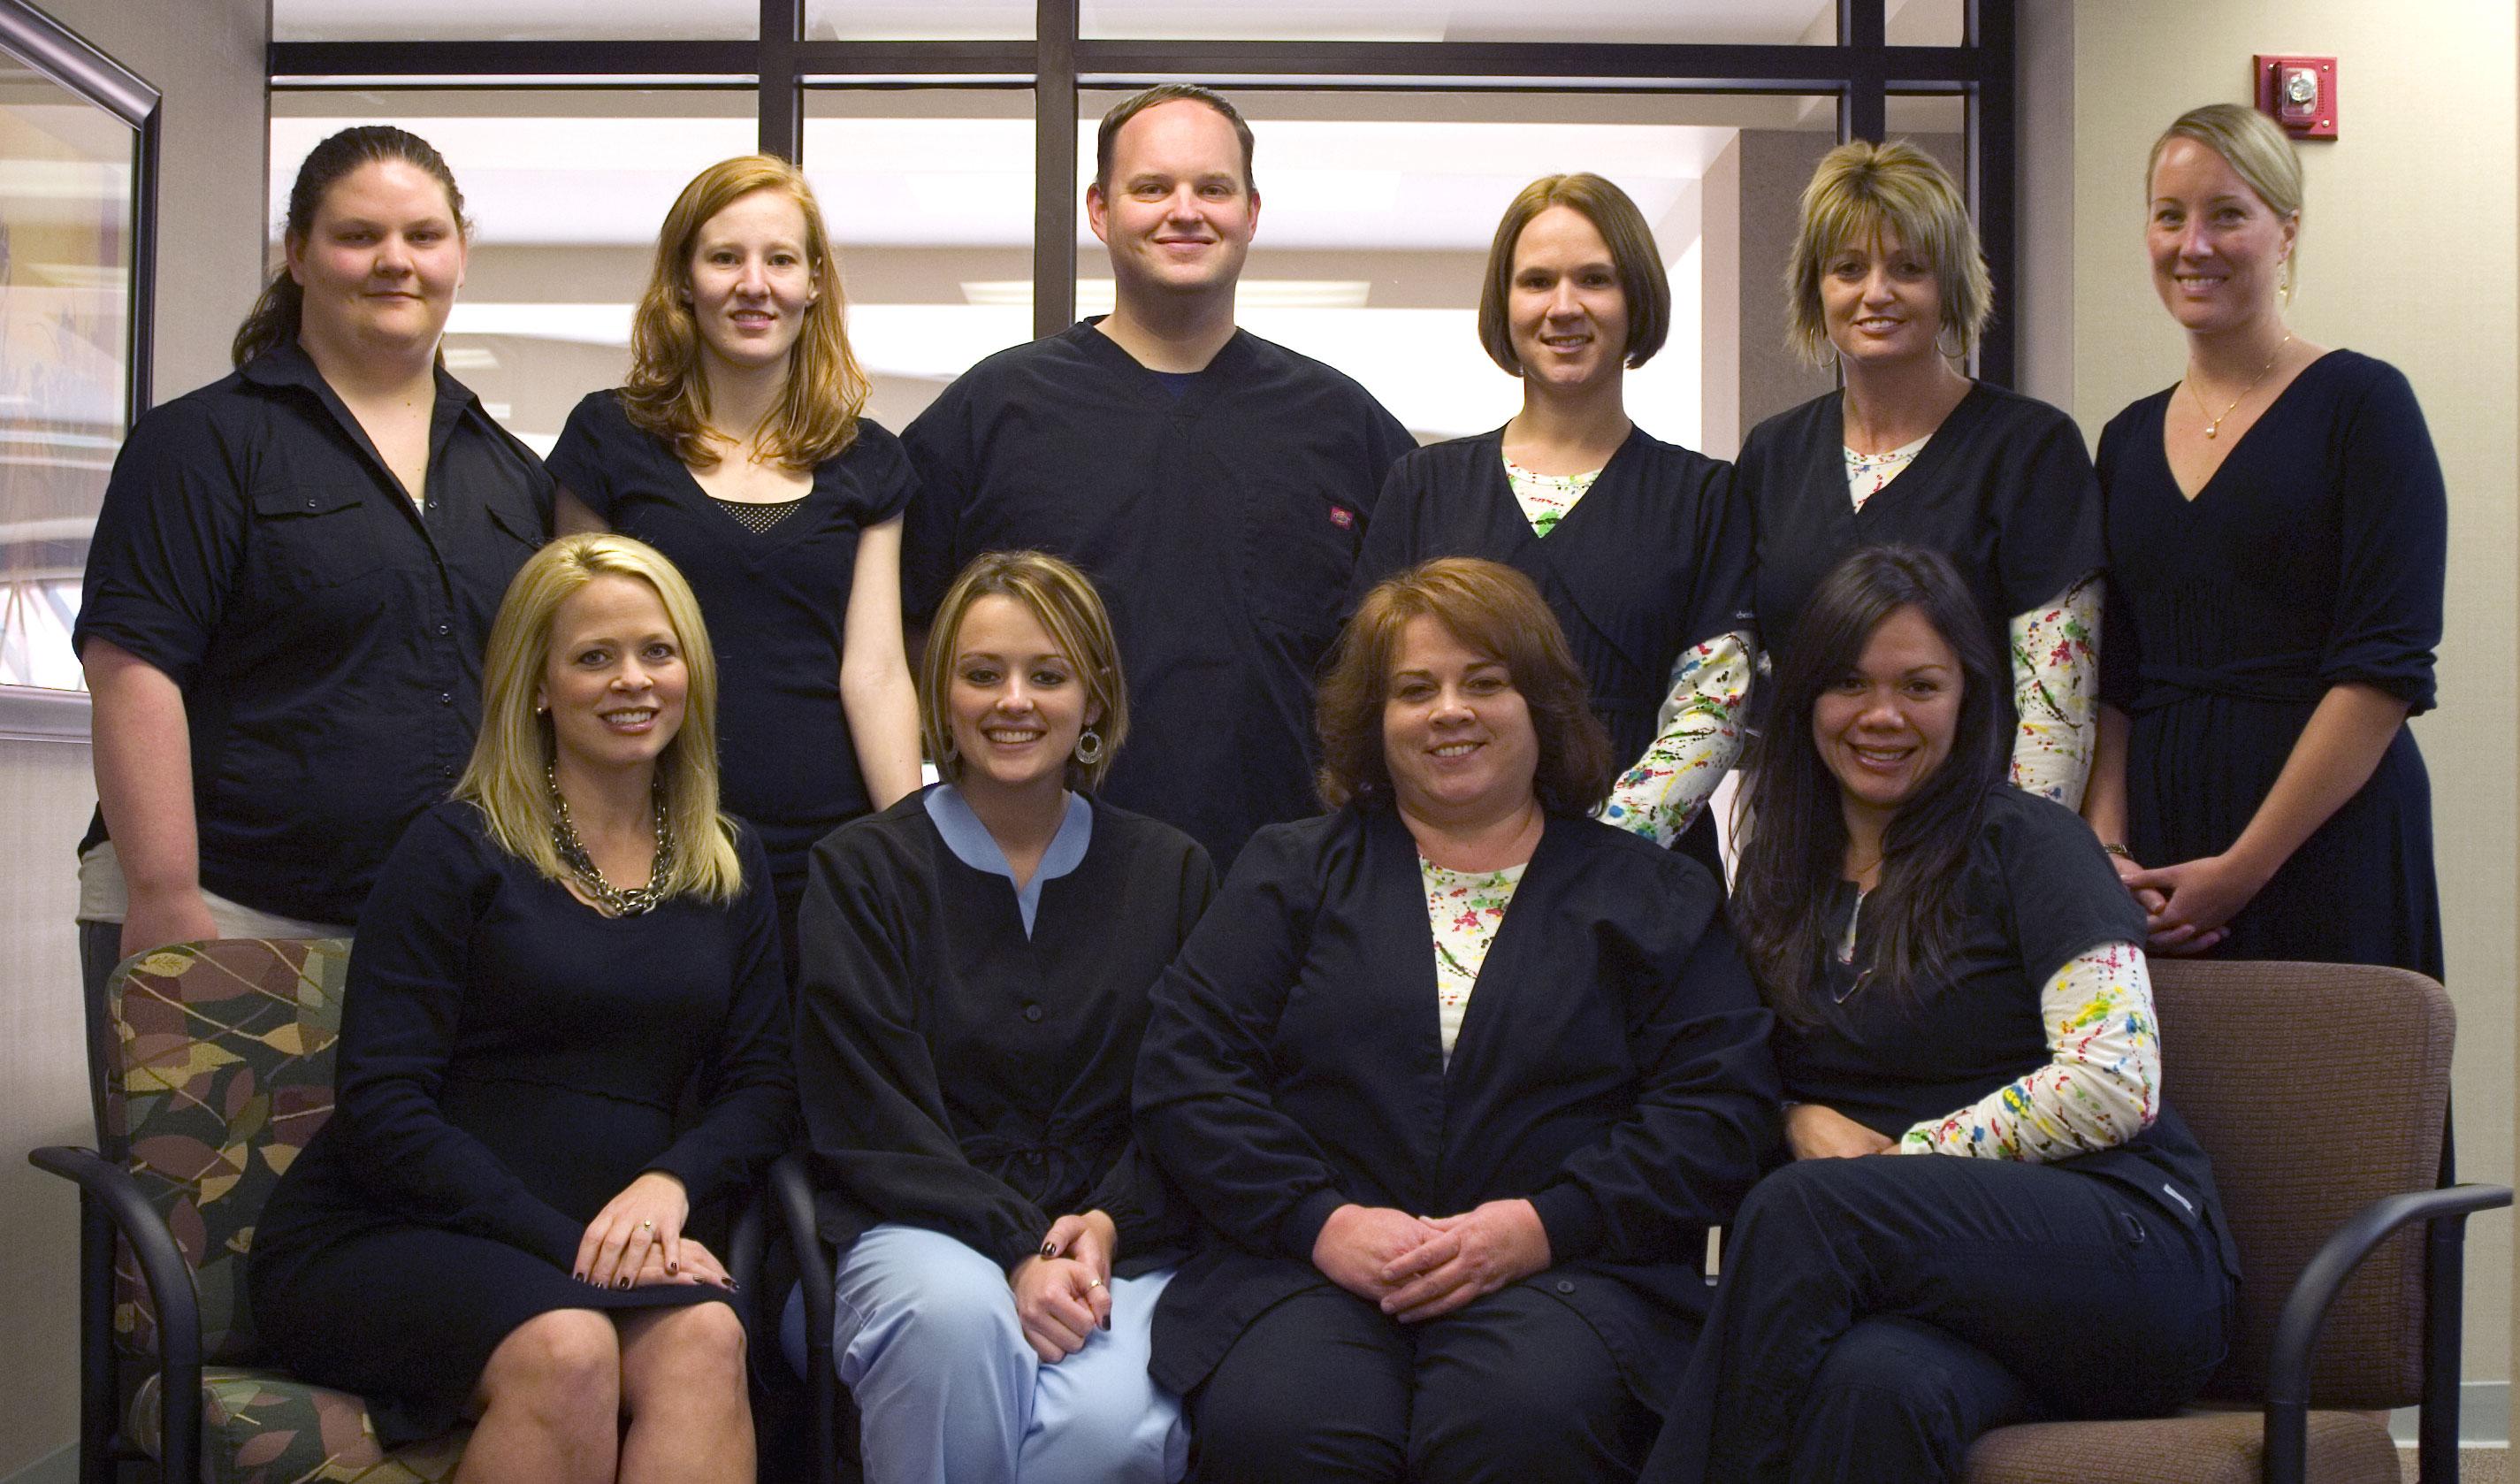 Staff Group Photo 89